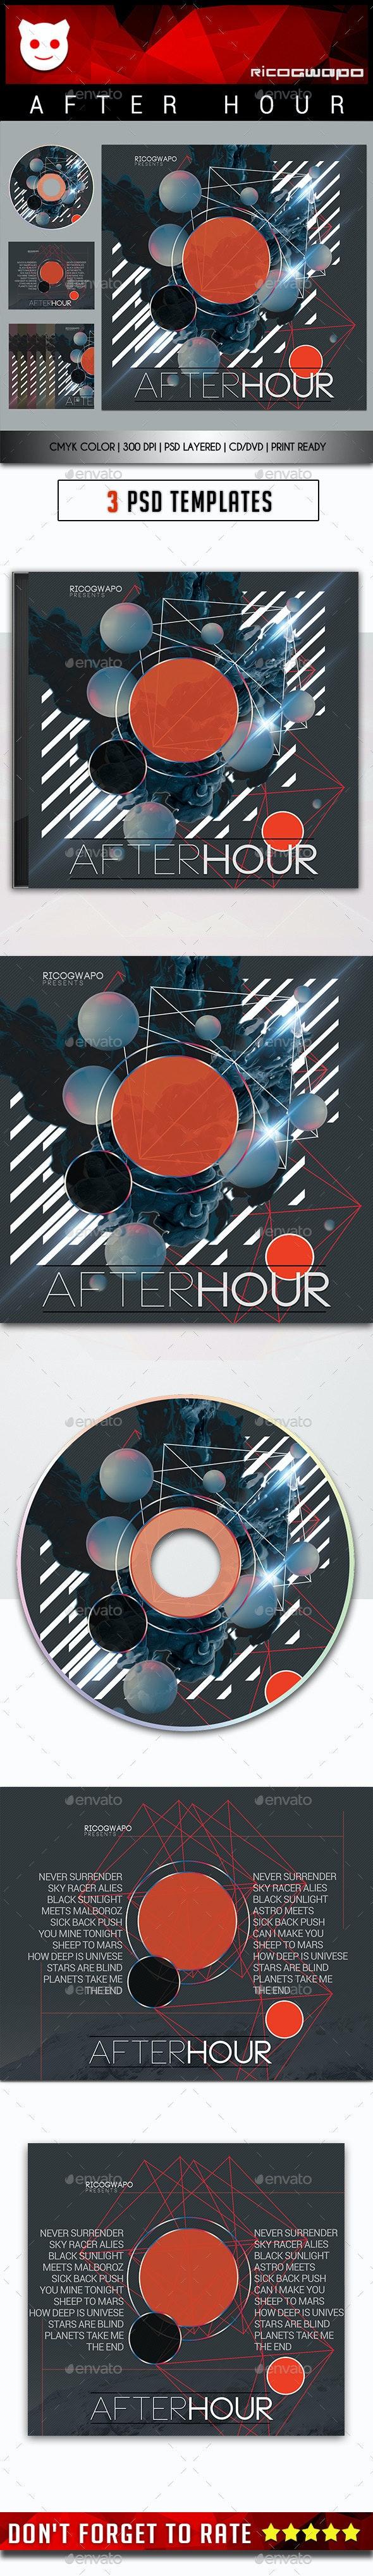 After Hour Cd/DVD Template - CD & DVD Artwork Print Templates